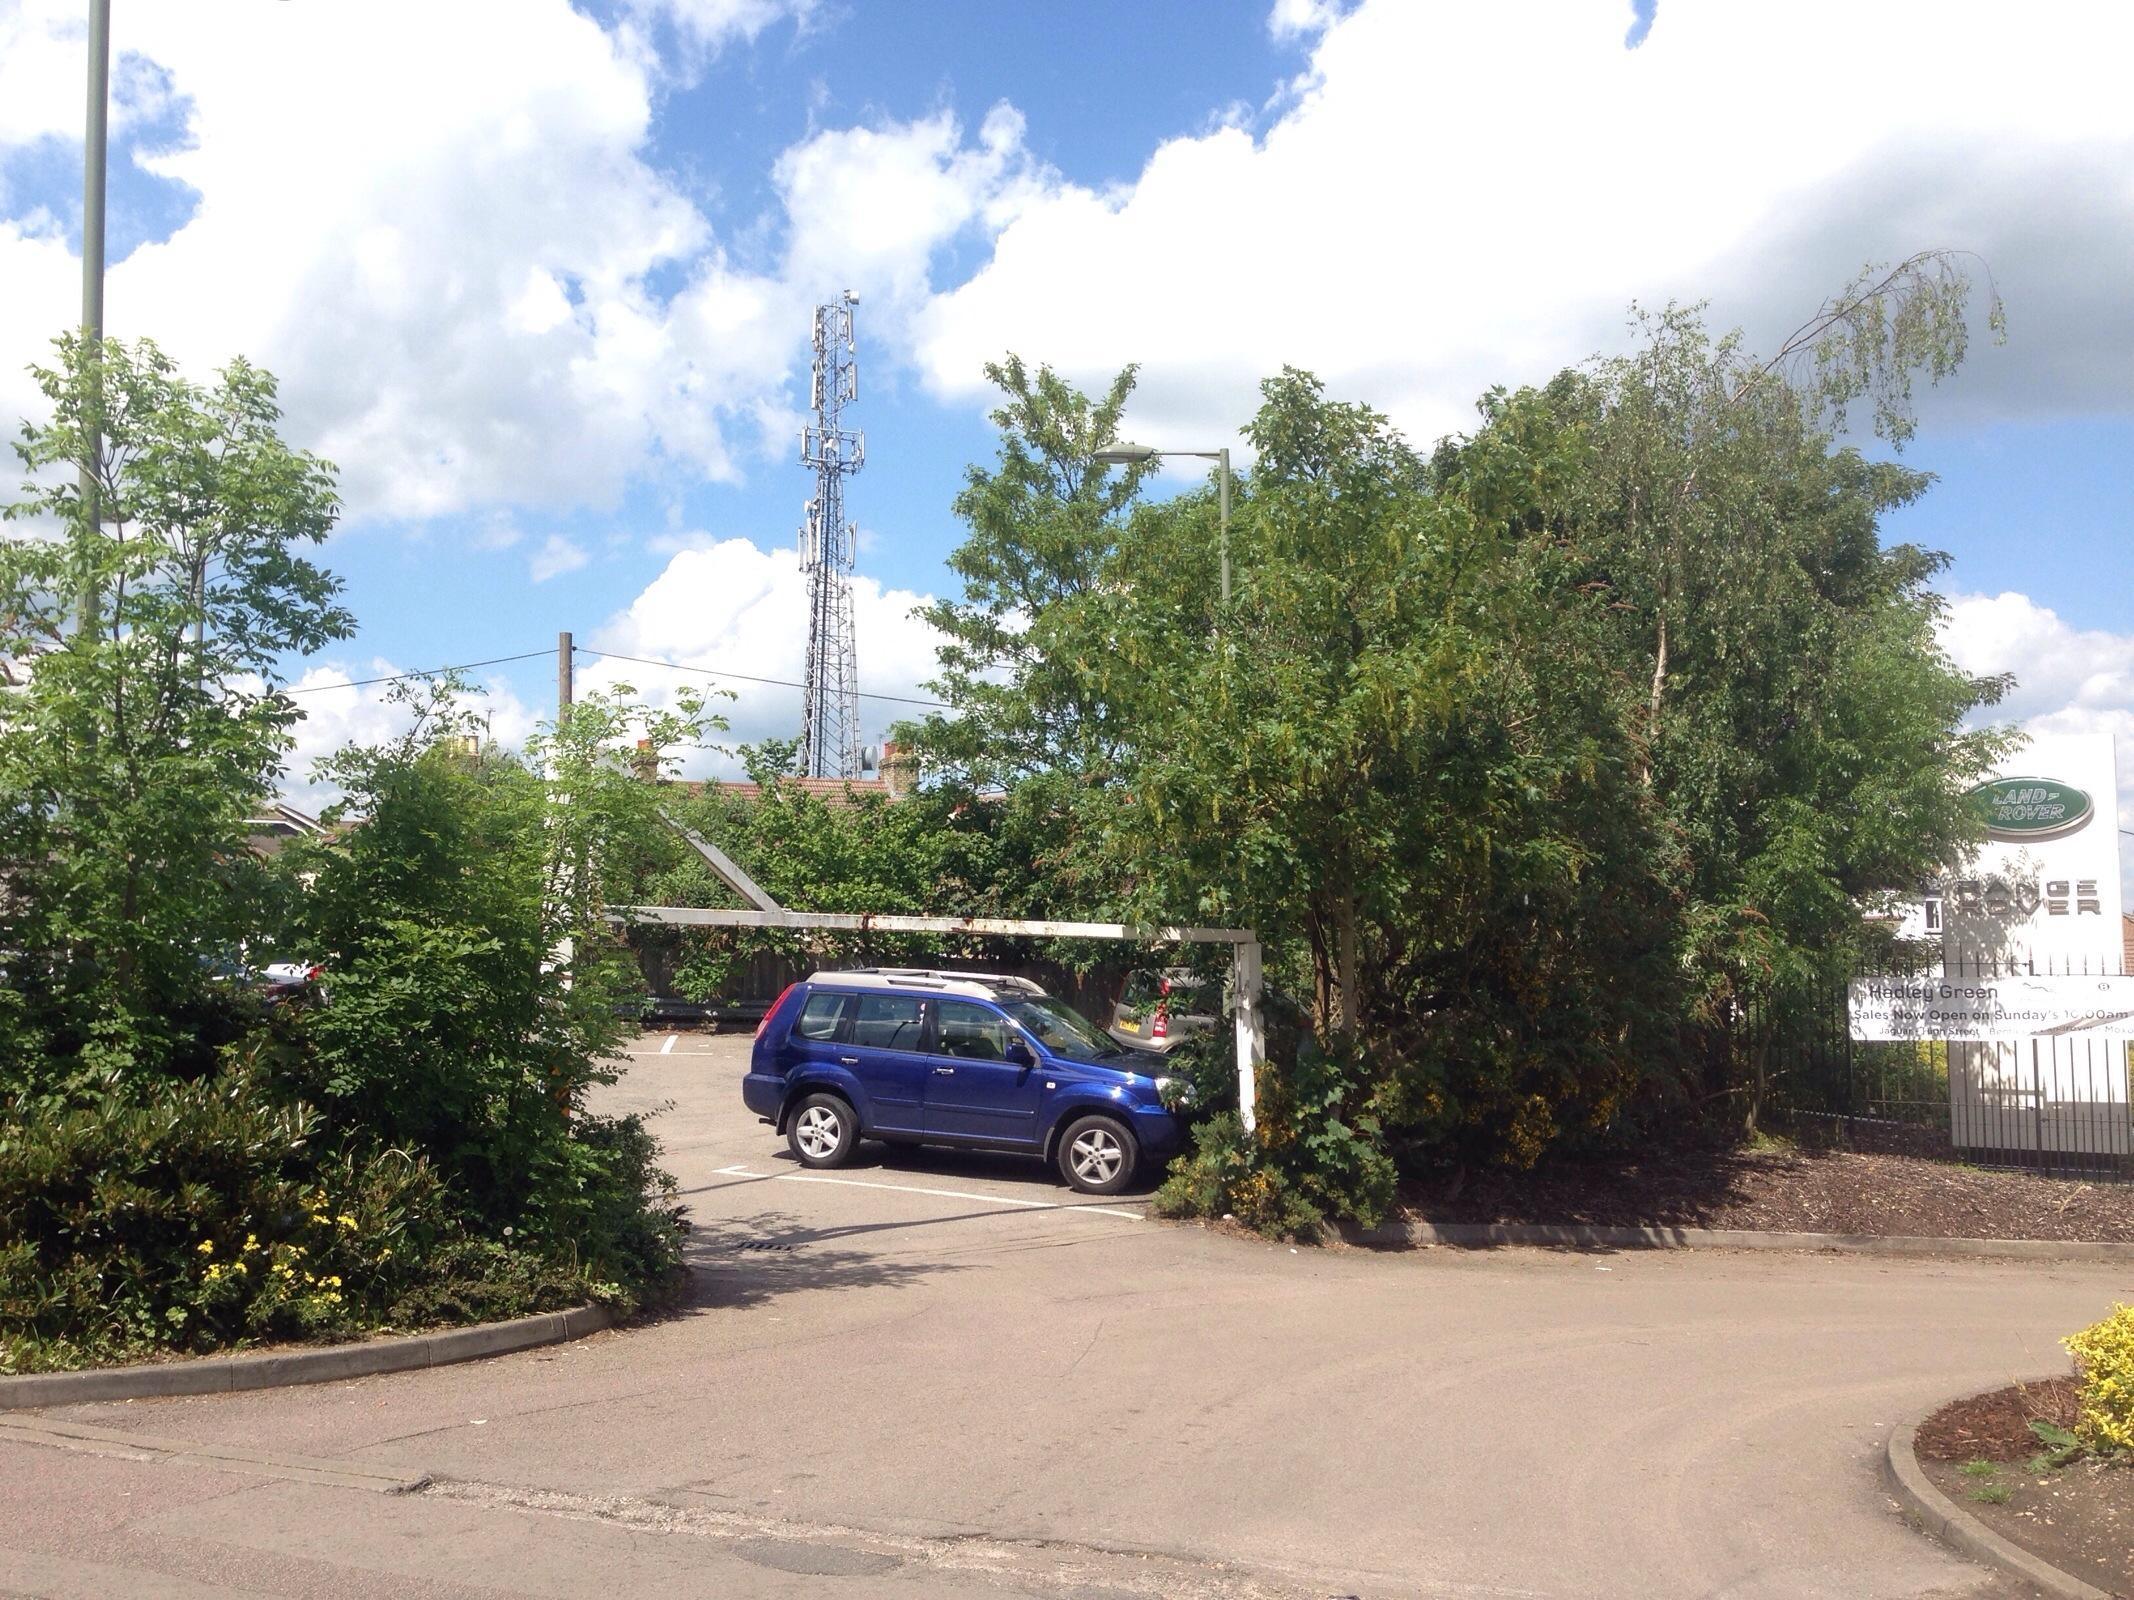 Moxon Street Car Park Barnet